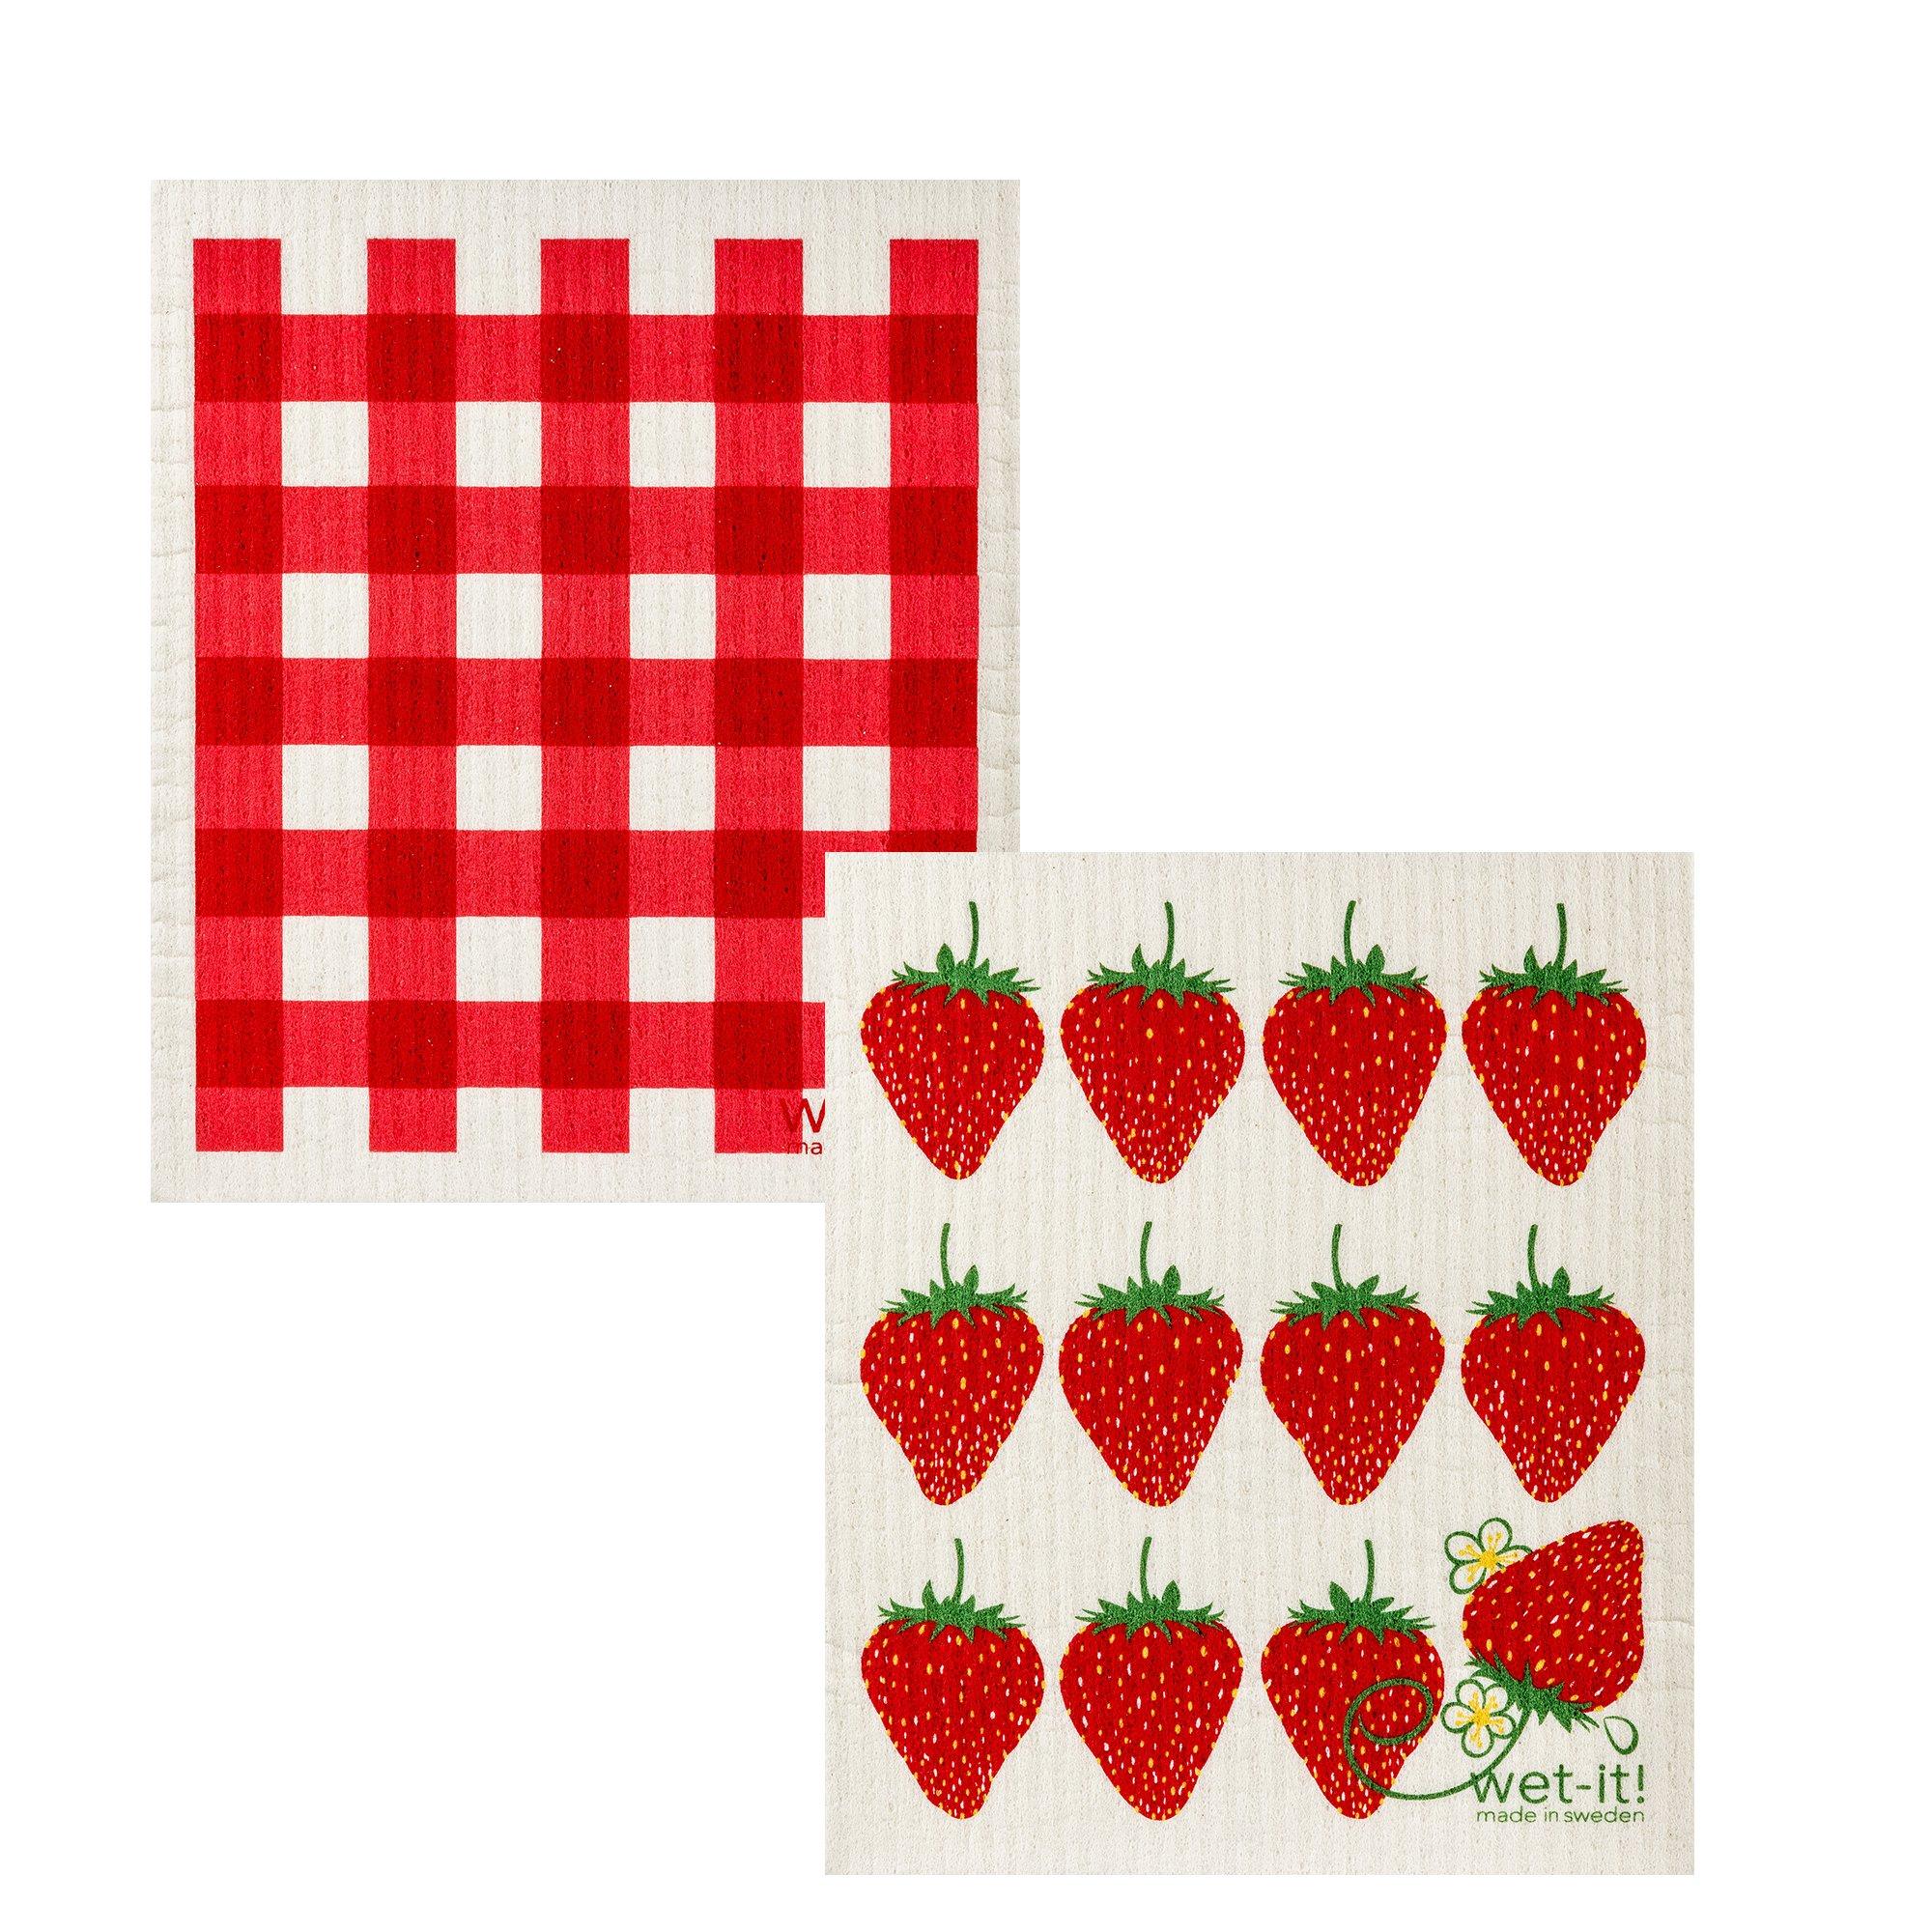 Wet-It Swedish Dishcloth Set of 2 (Strawberries and Plaid)